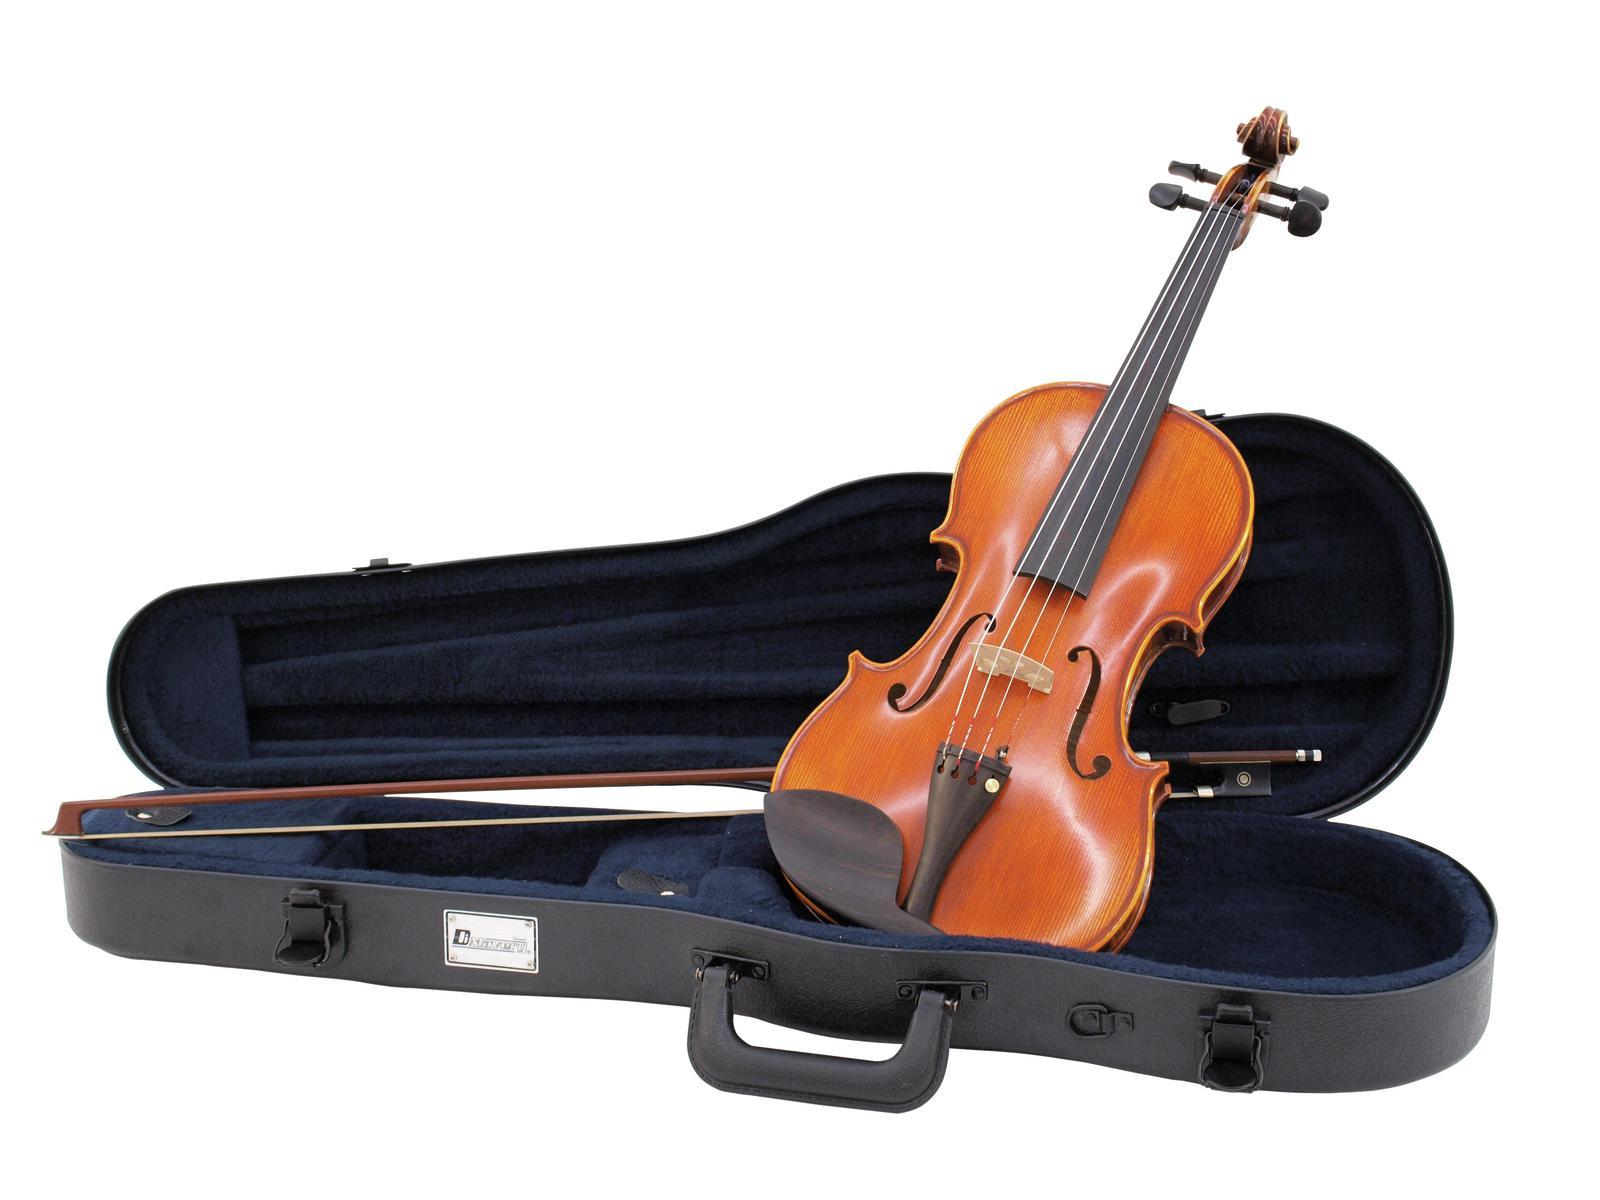 Dimavery ABS kufr pro 1/8 housle